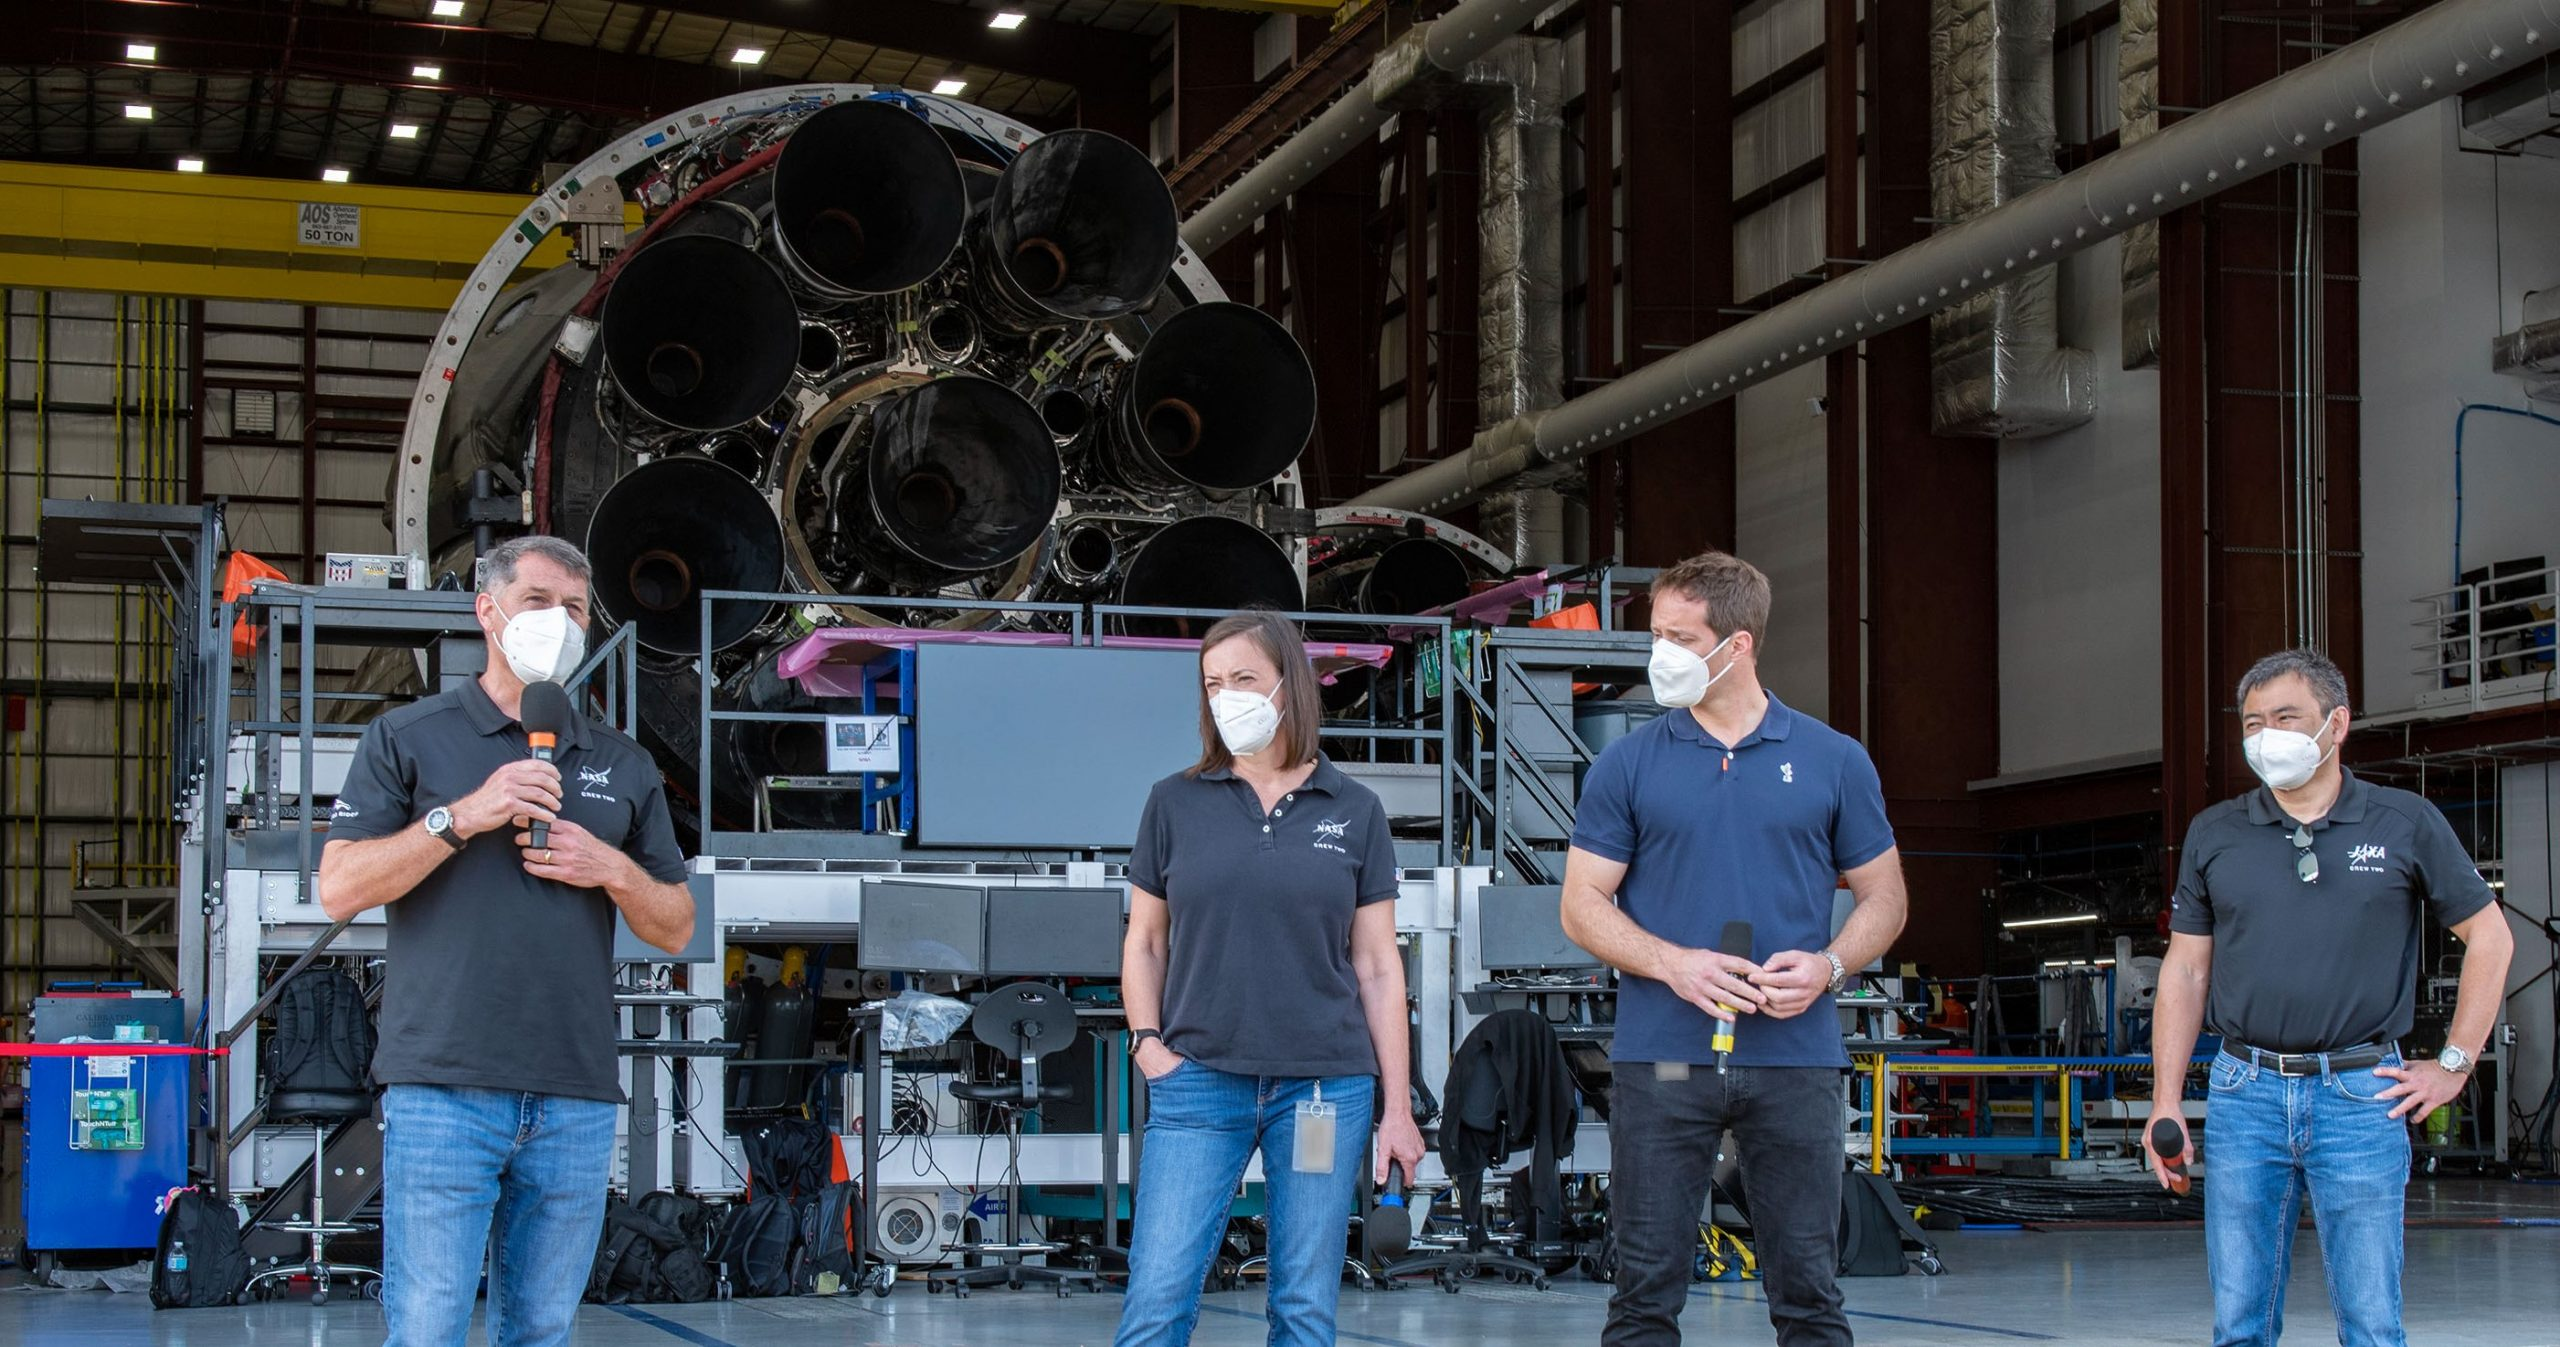 Crew-2 Falcon 9 B1061 39A hangar tour Pesquet Kimbrough Hoshide McArthur 2021 (SpaceX) octaweb 1 crop